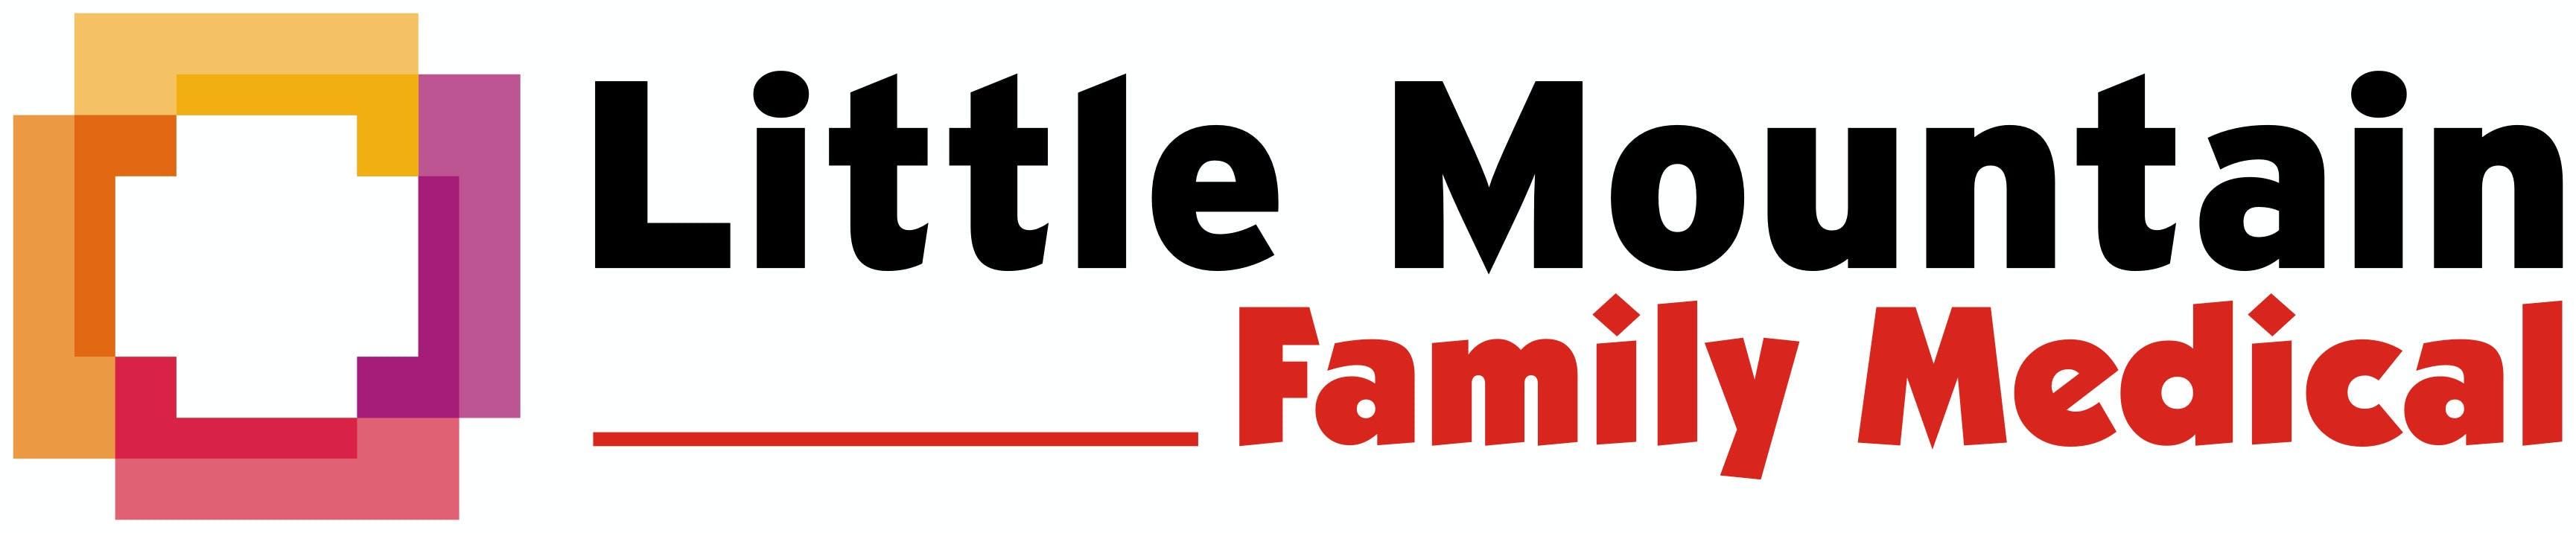 Little Mountain Family Medical Logo